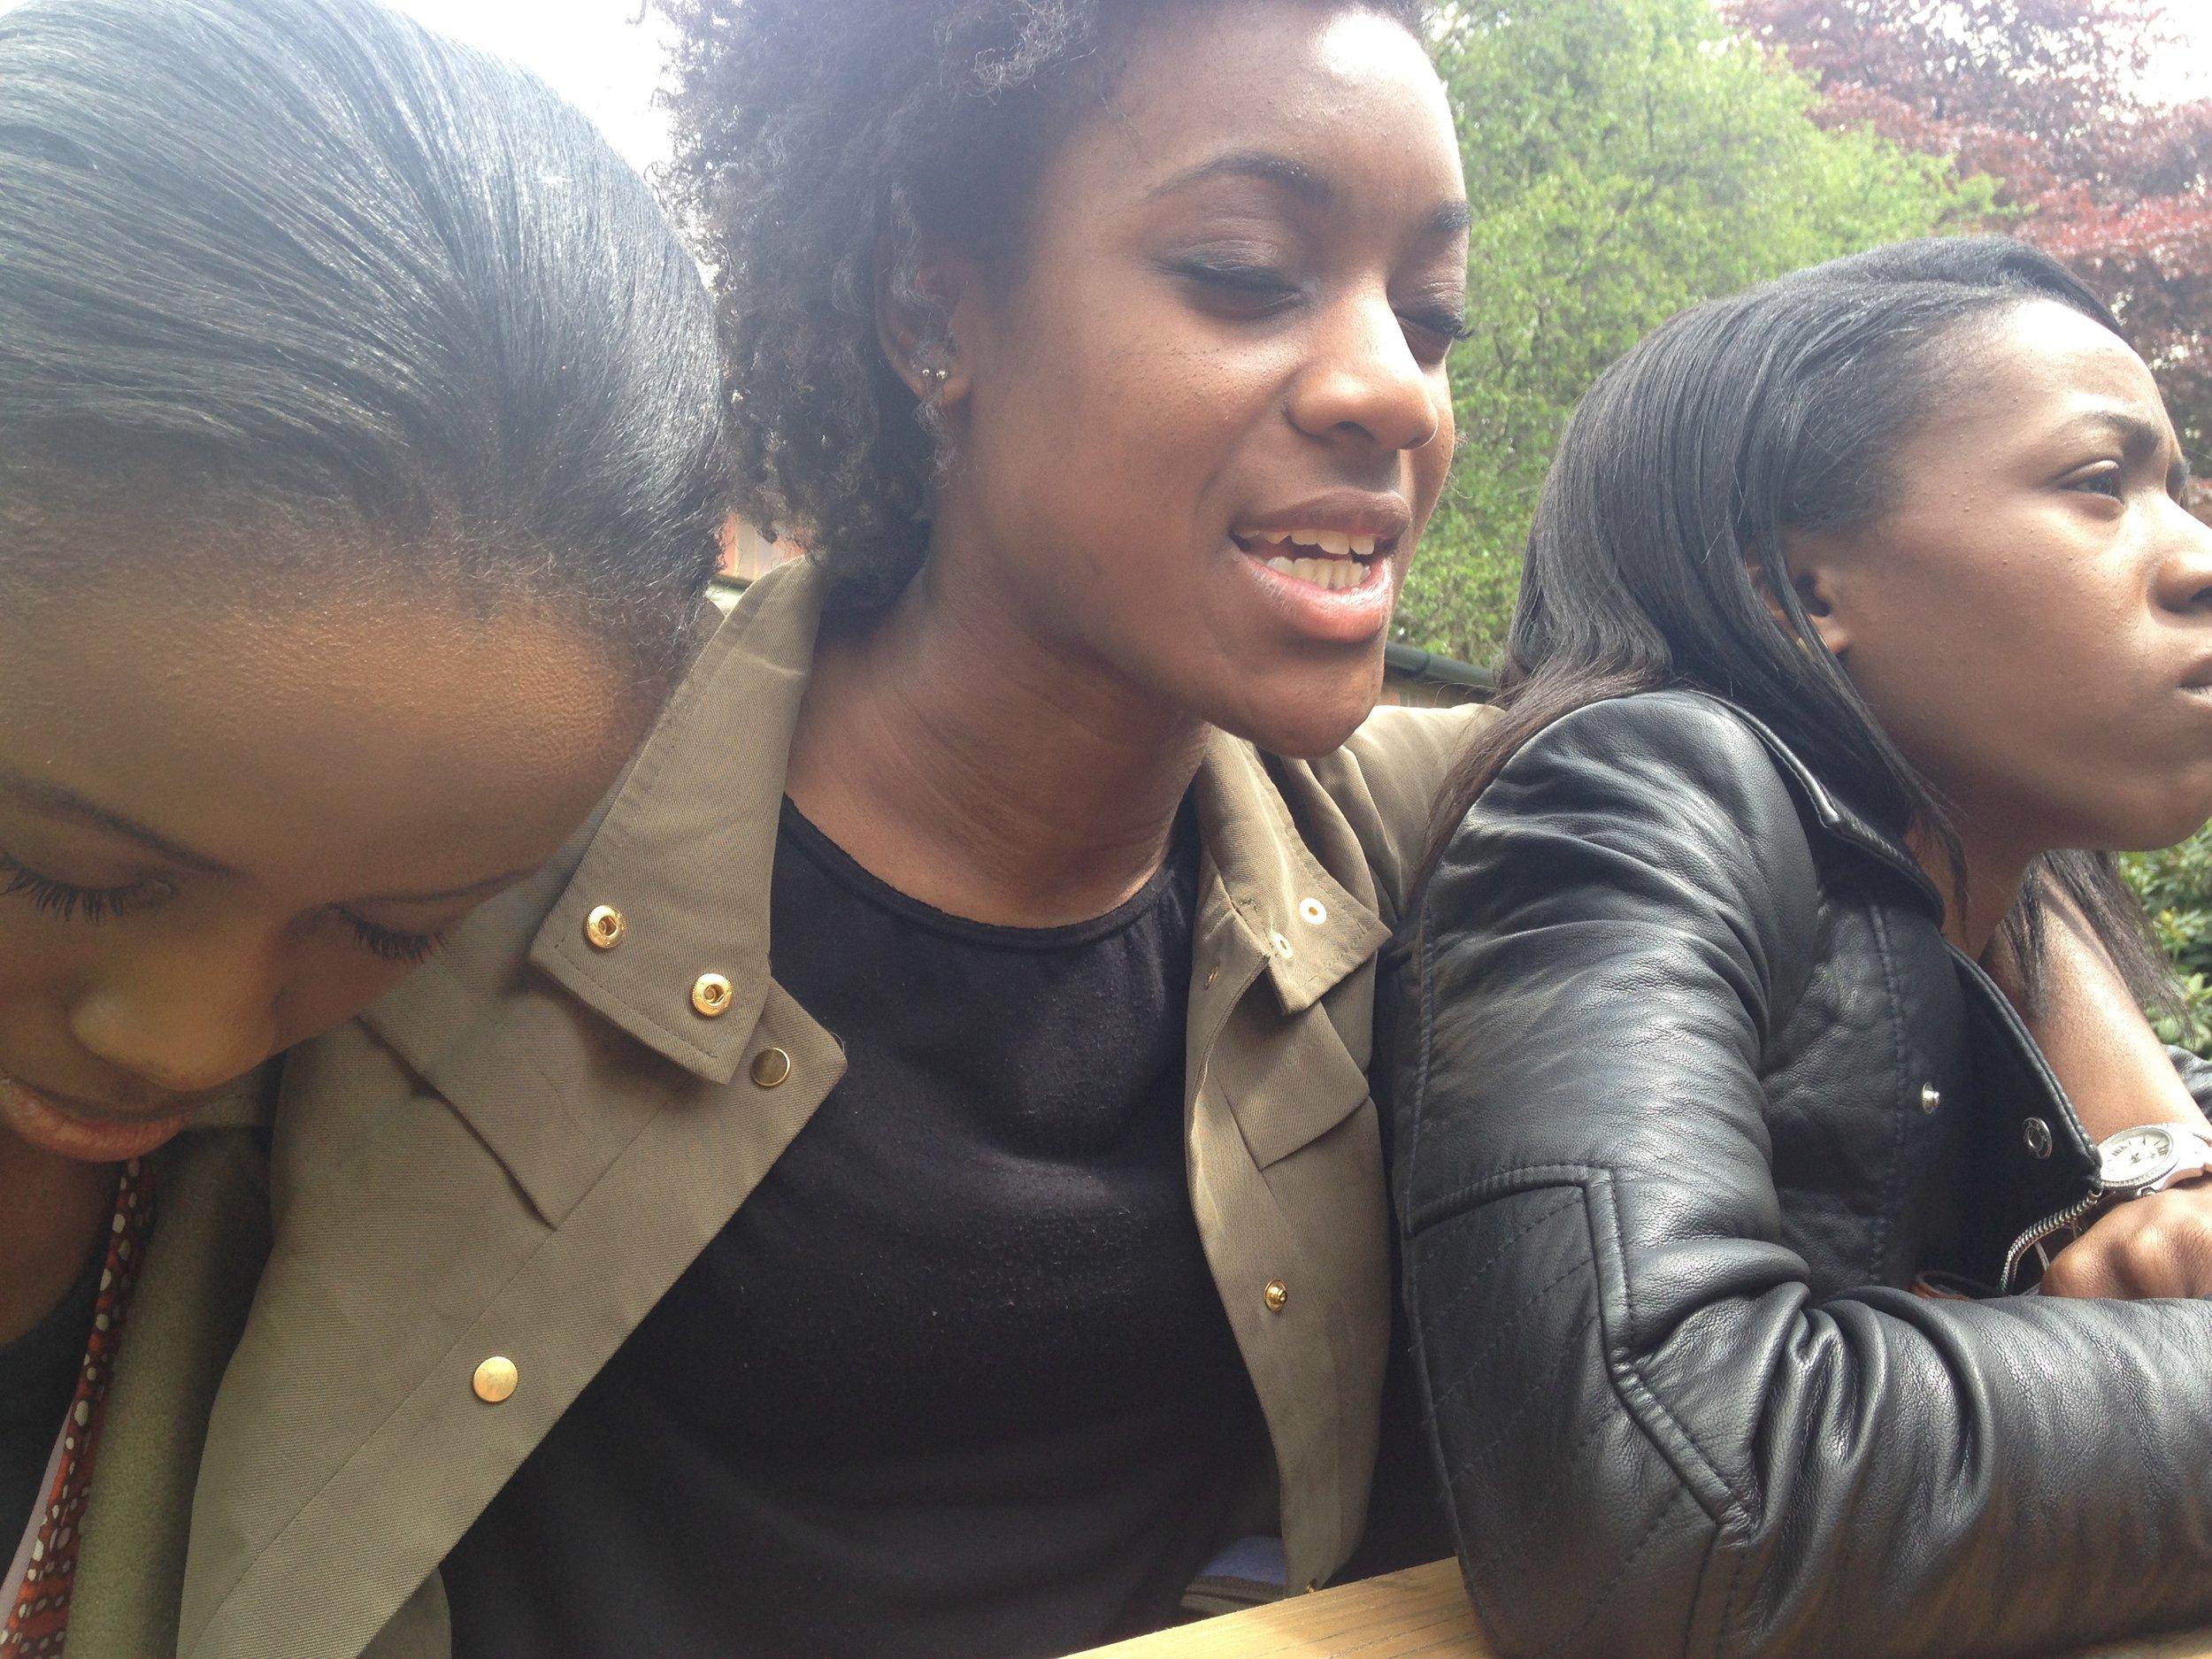 Samia Kanu, Shakira Bullen, Chidinma Obi, pray at University of Birmingham, UK, May 15, 2016